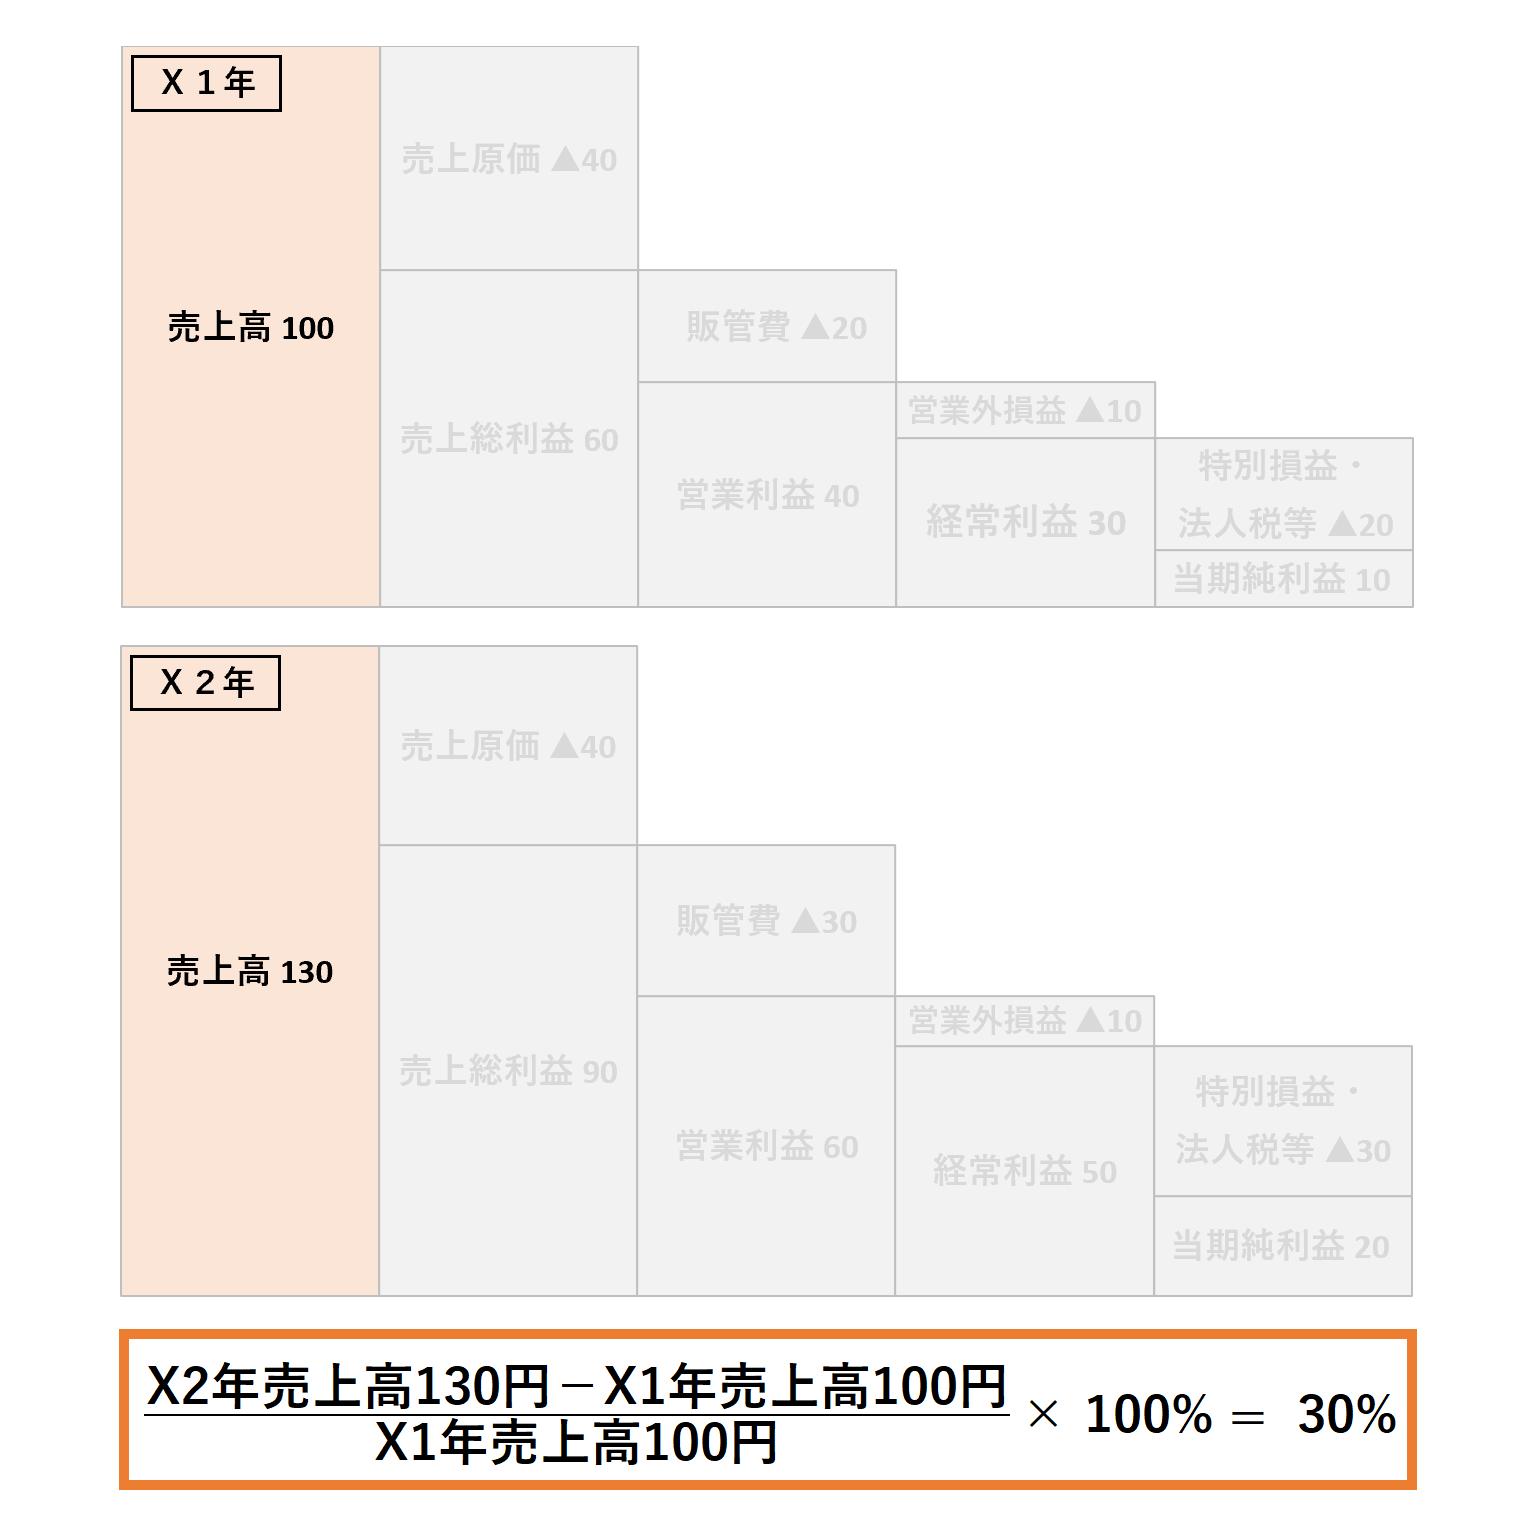 成長性分析(2級):売上高の伸び率ー解答